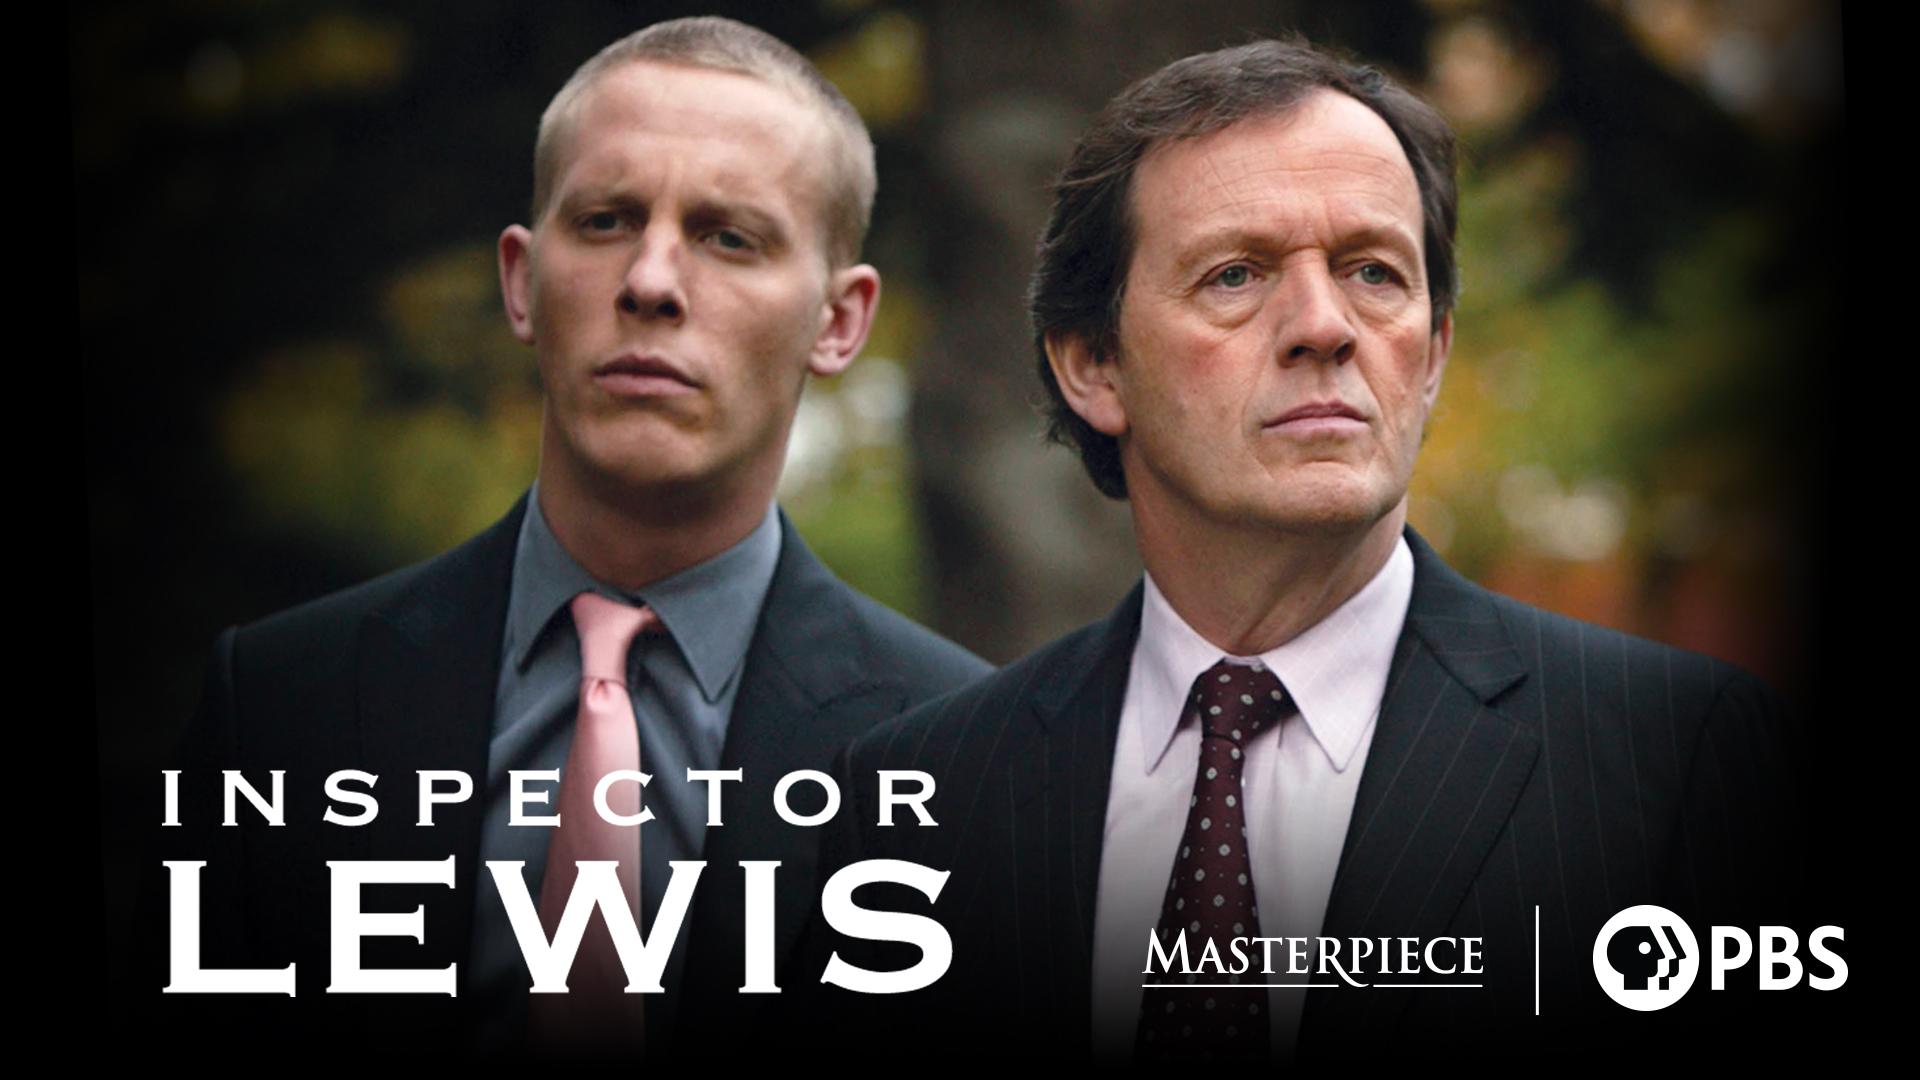 Masterpiece: Inspector Lewis Season 1